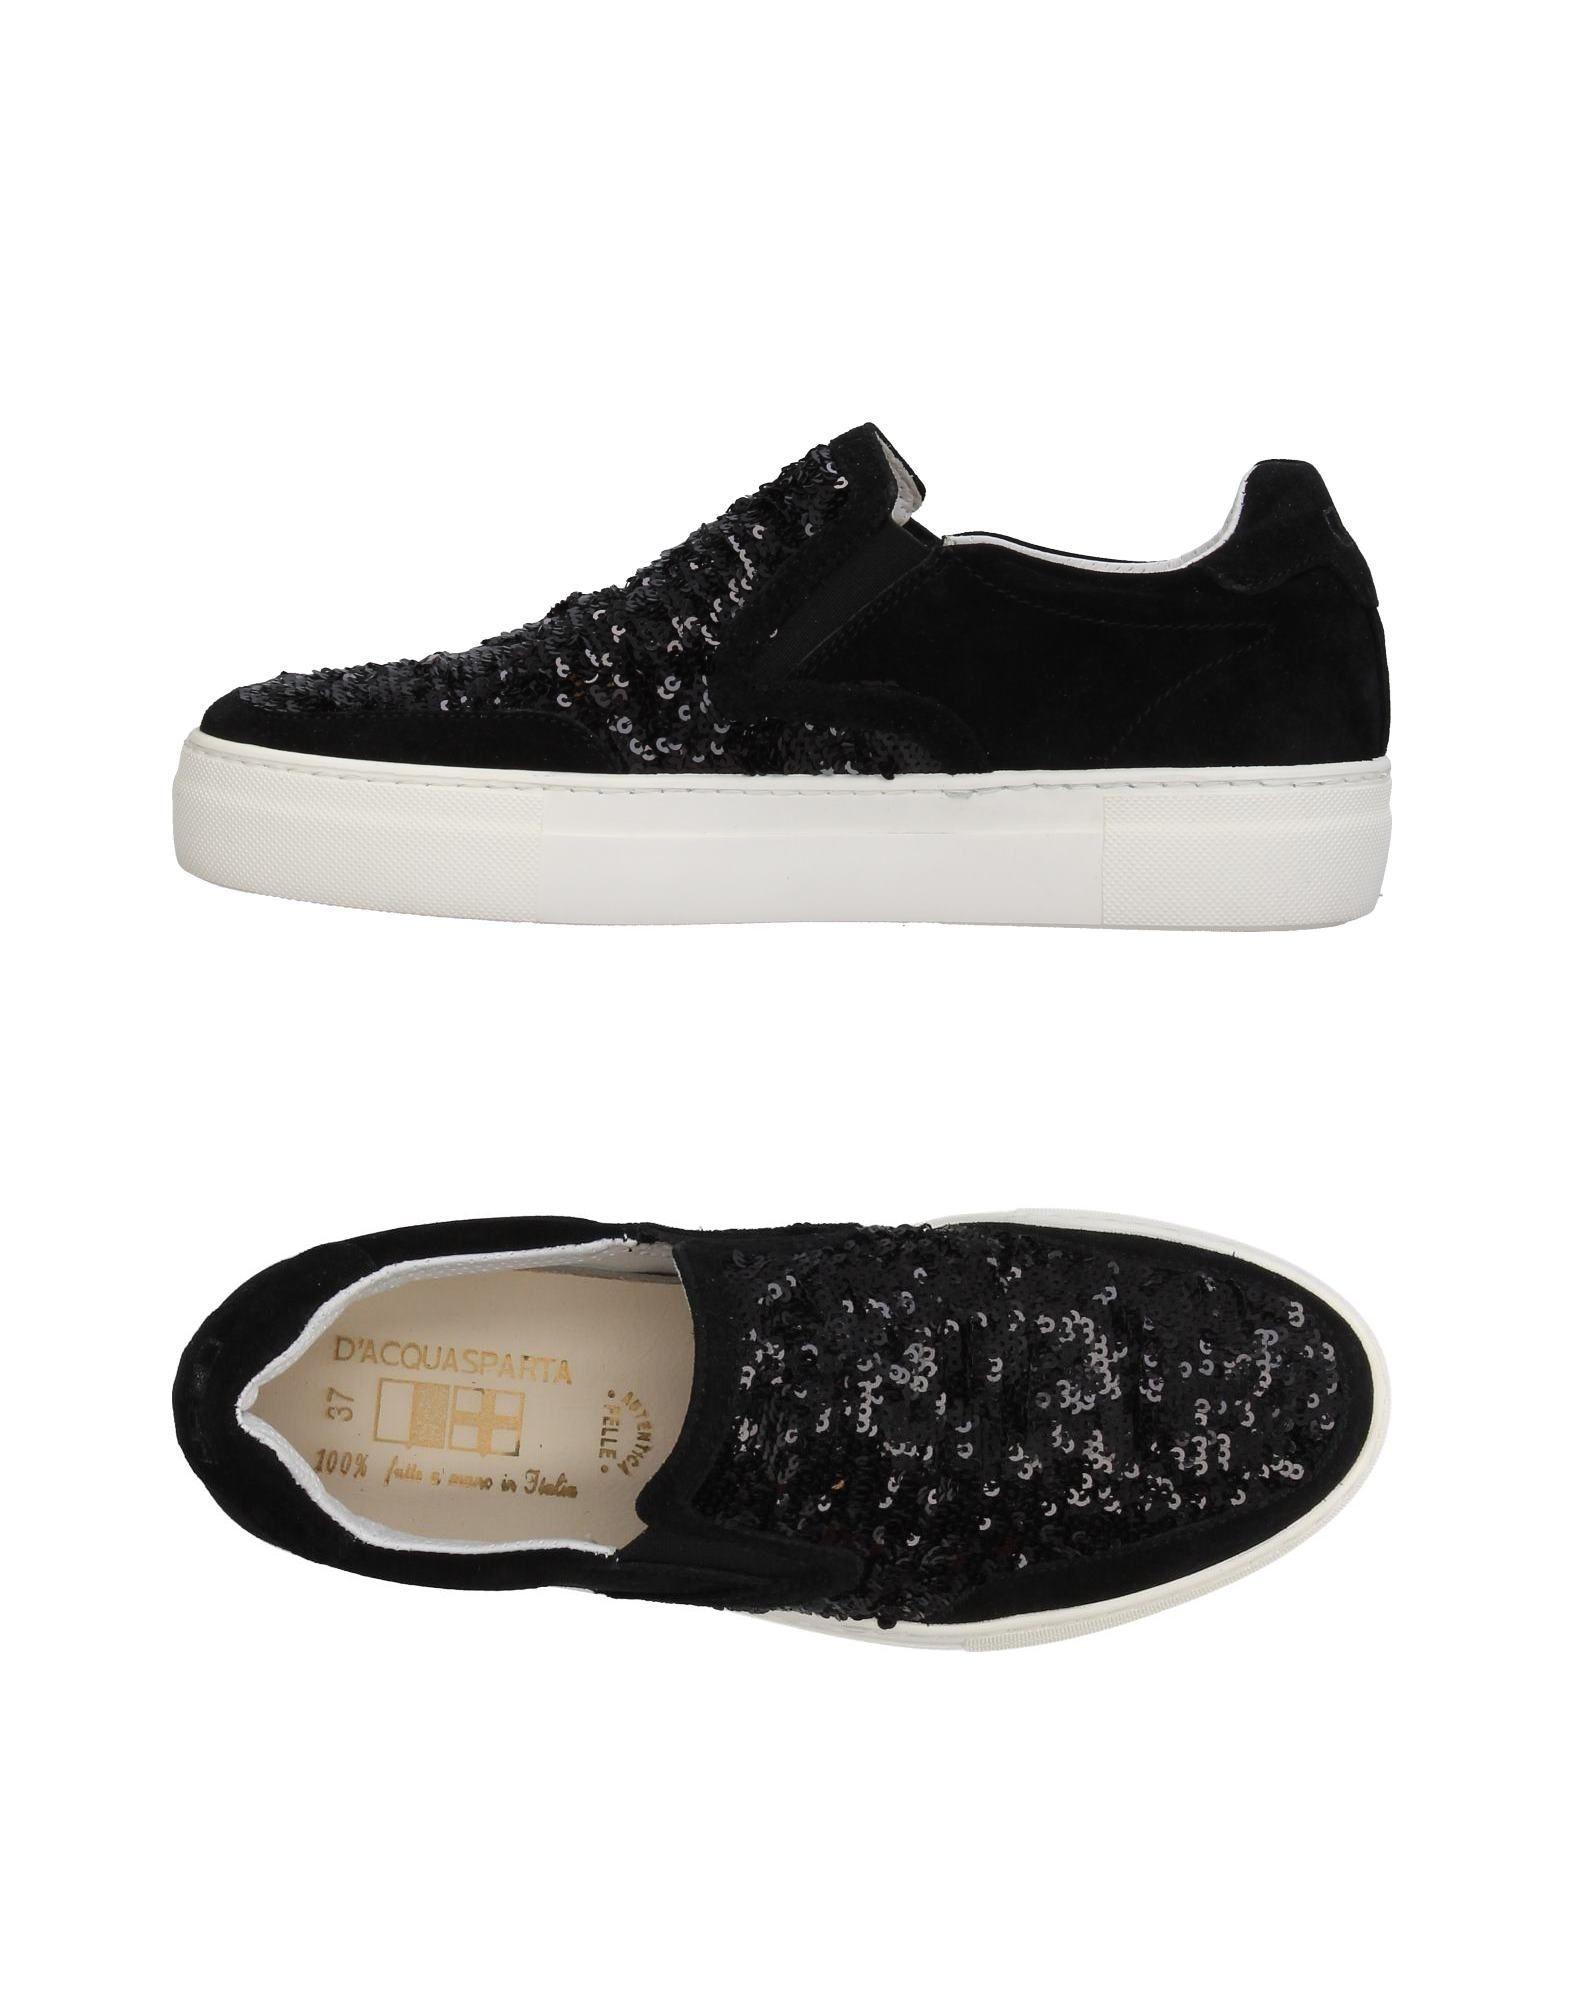 D'Acquasparta Sneakers Damen  11390387SP Gute Qualität beliebte Schuhe